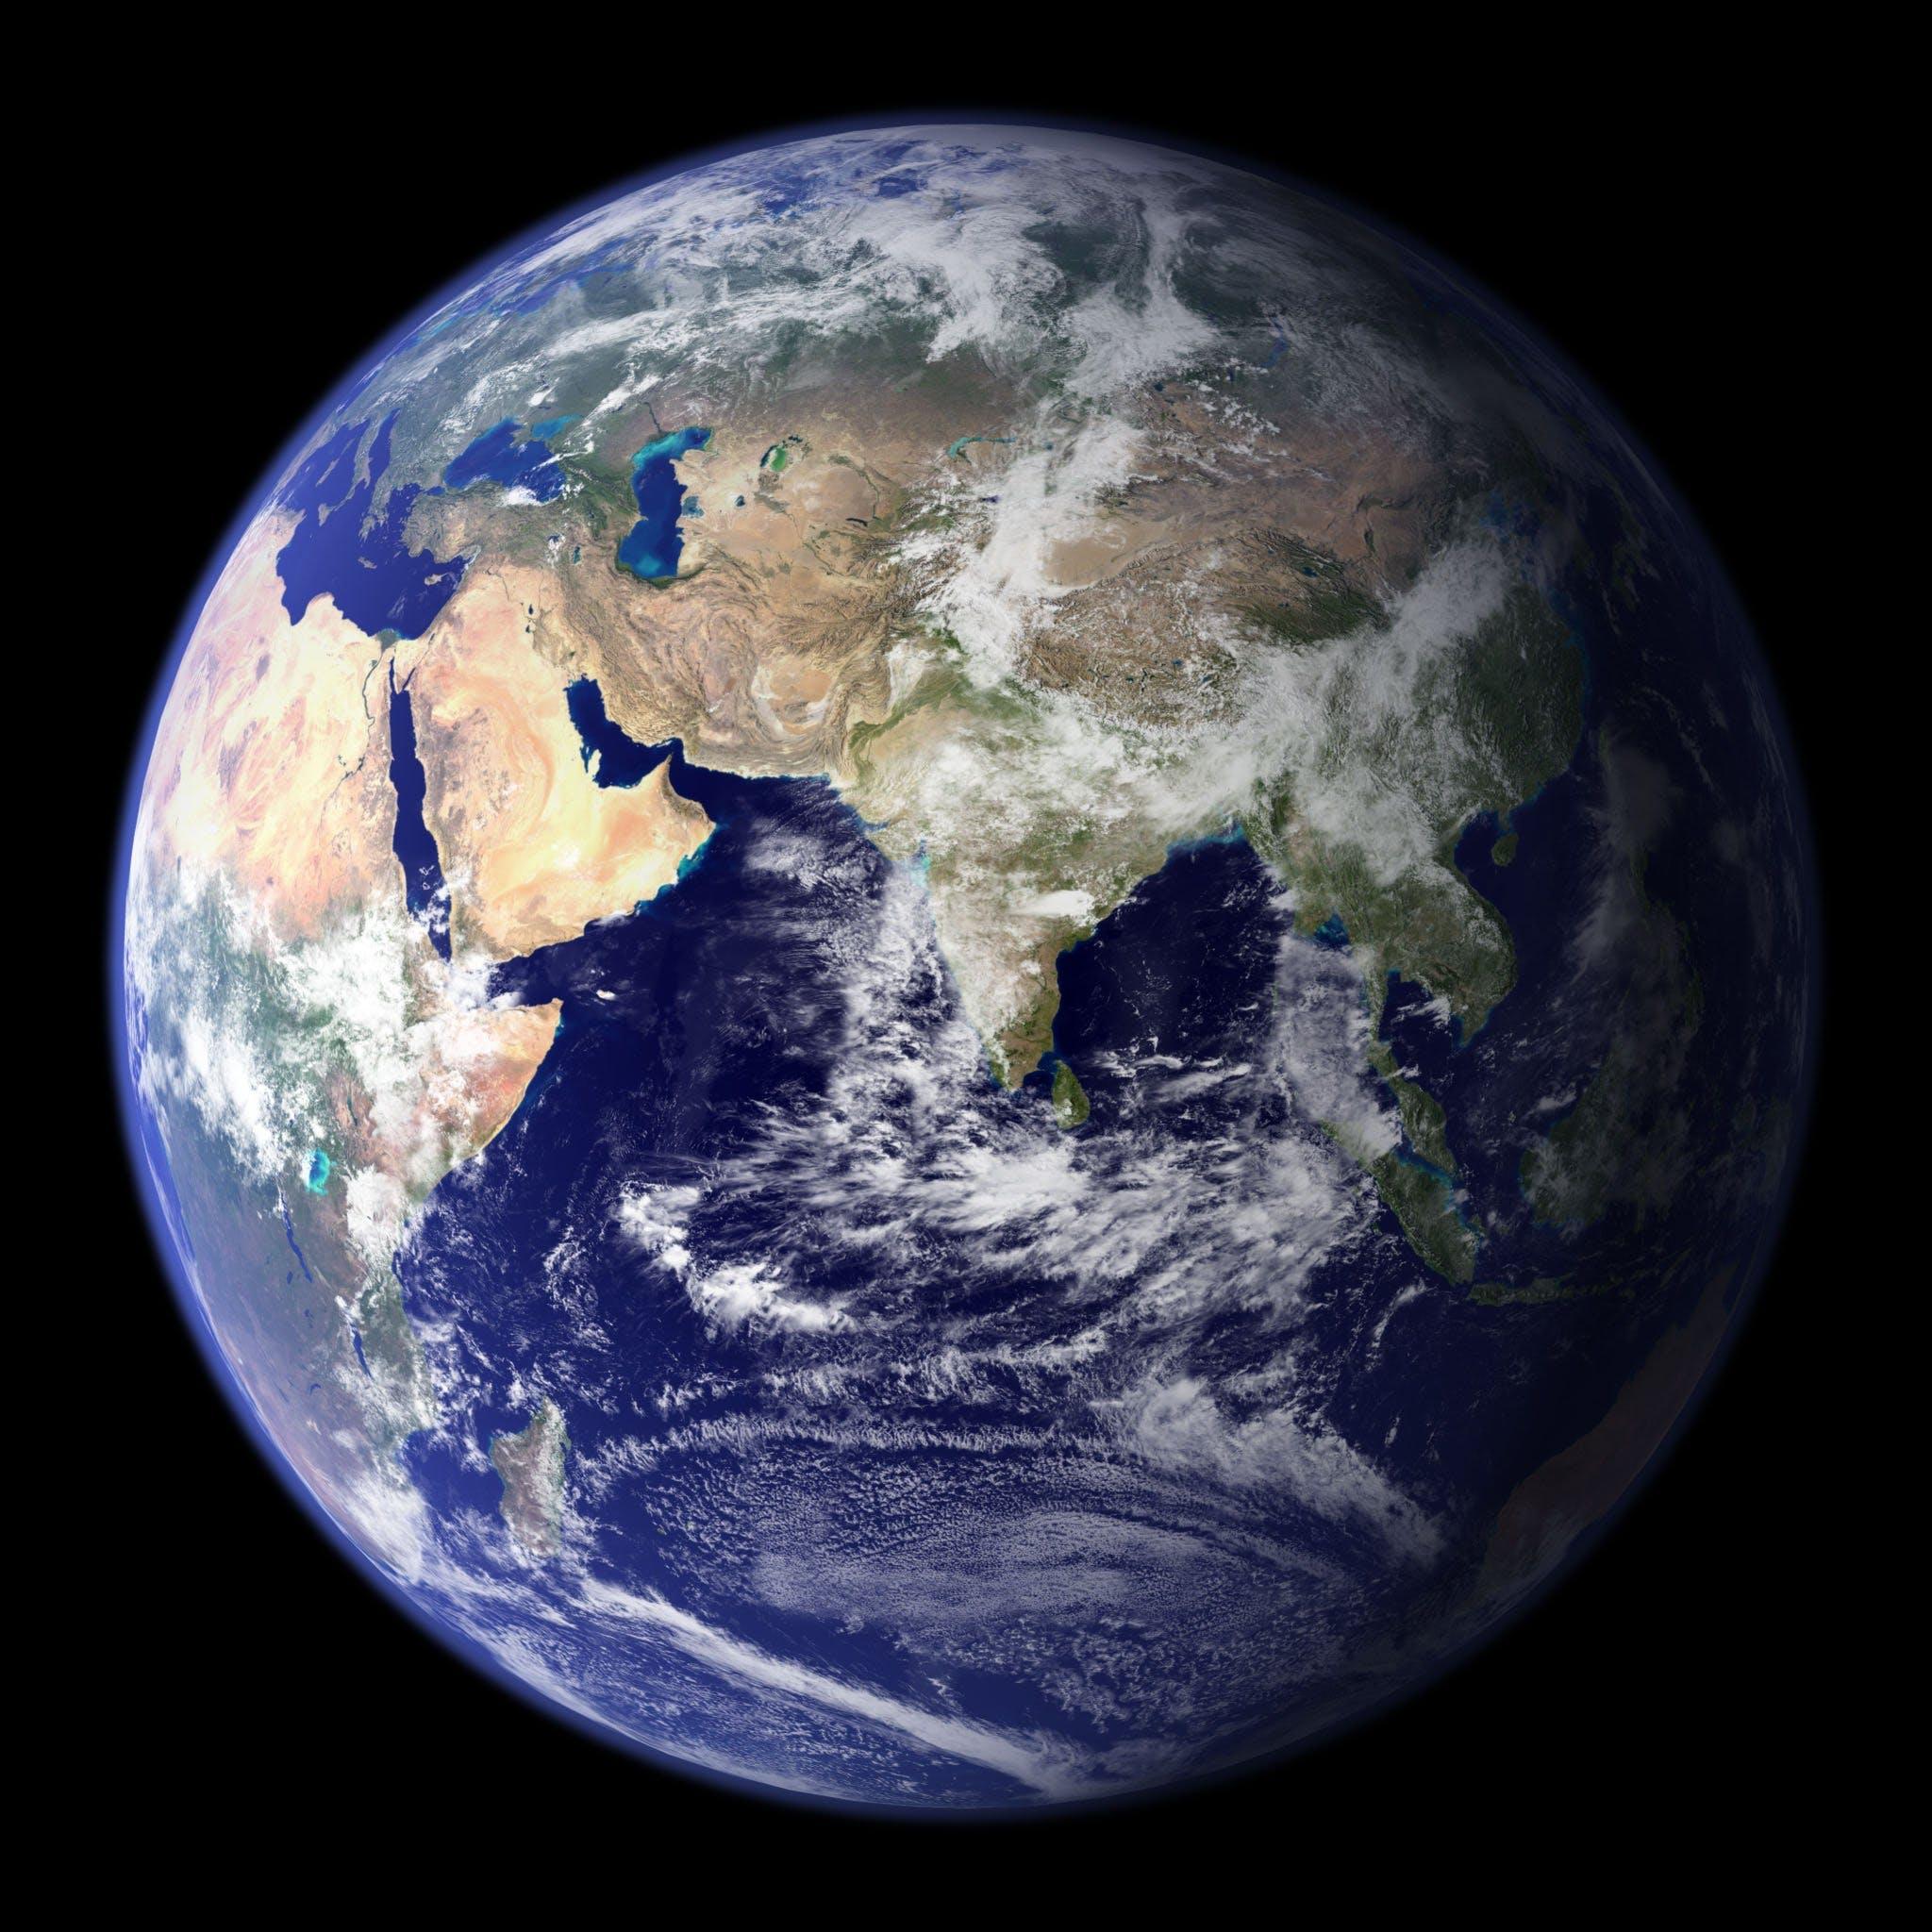 blue planet, earth, globe